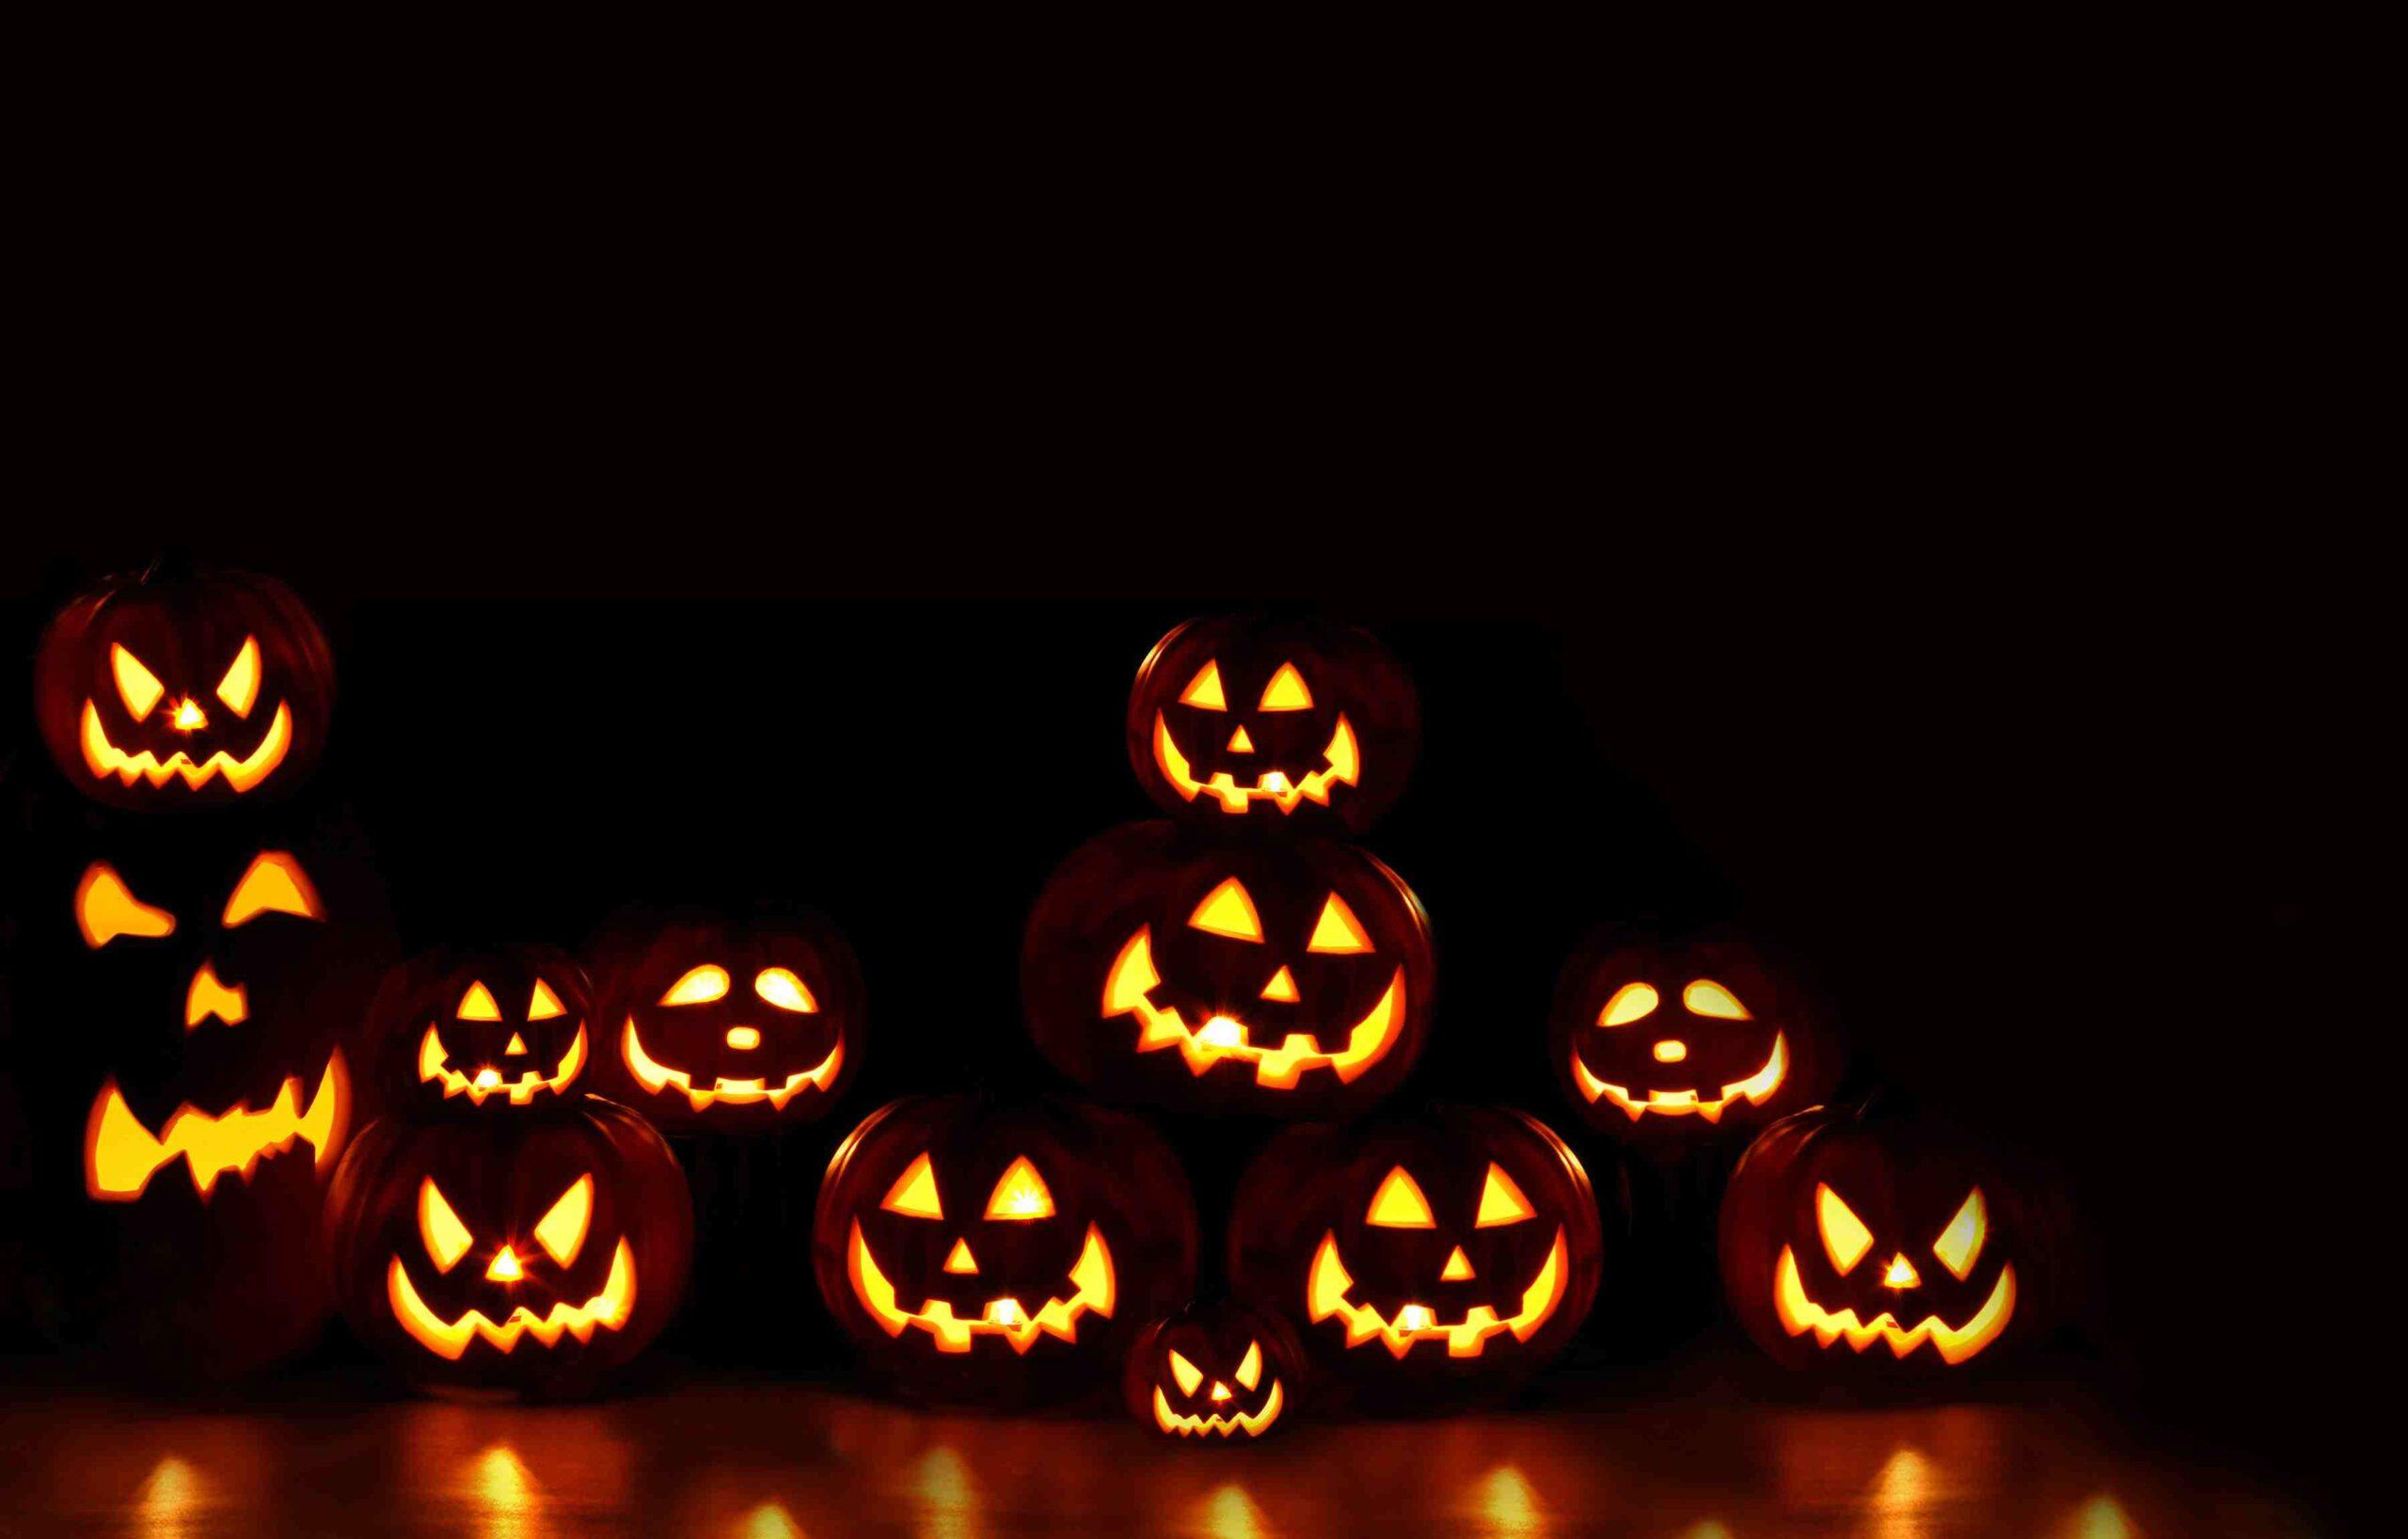 Dangerous Pumkin For You Halloween Day 2020